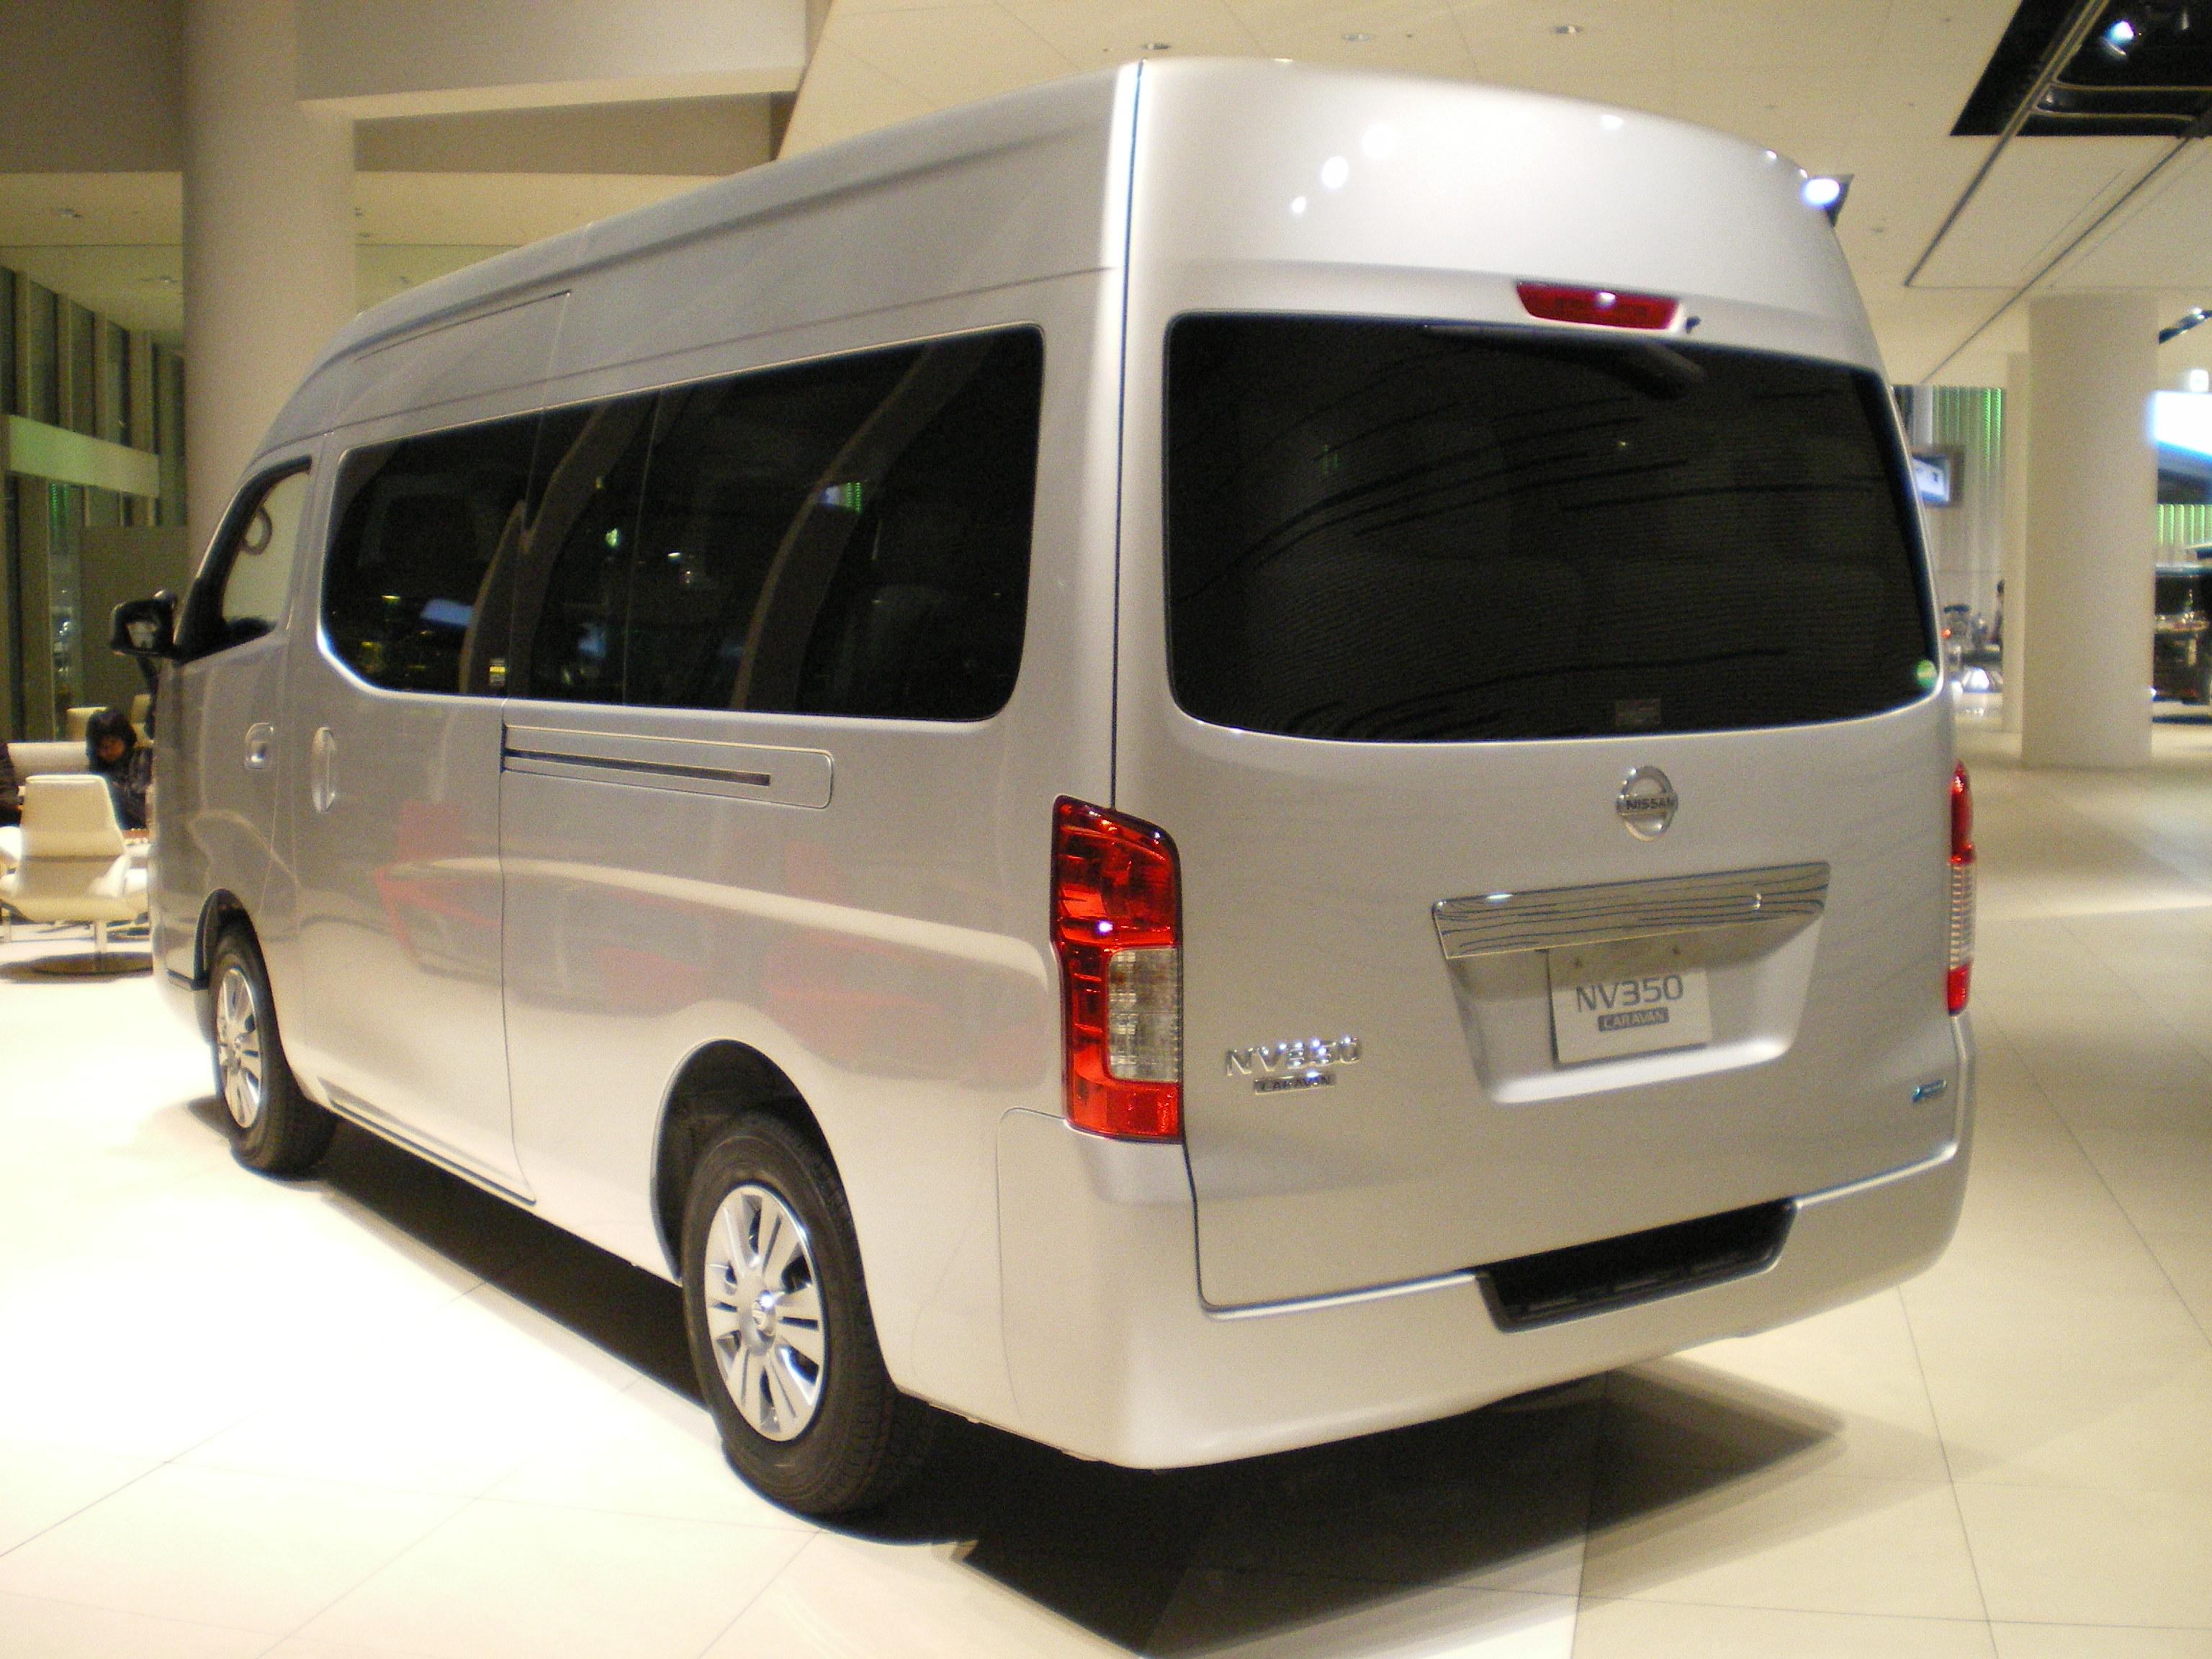 Nissan Nv Passenger >> File:NISSAN NV350 CARAVAN WIDEBODY E26 02.JPG - Wikimedia ...